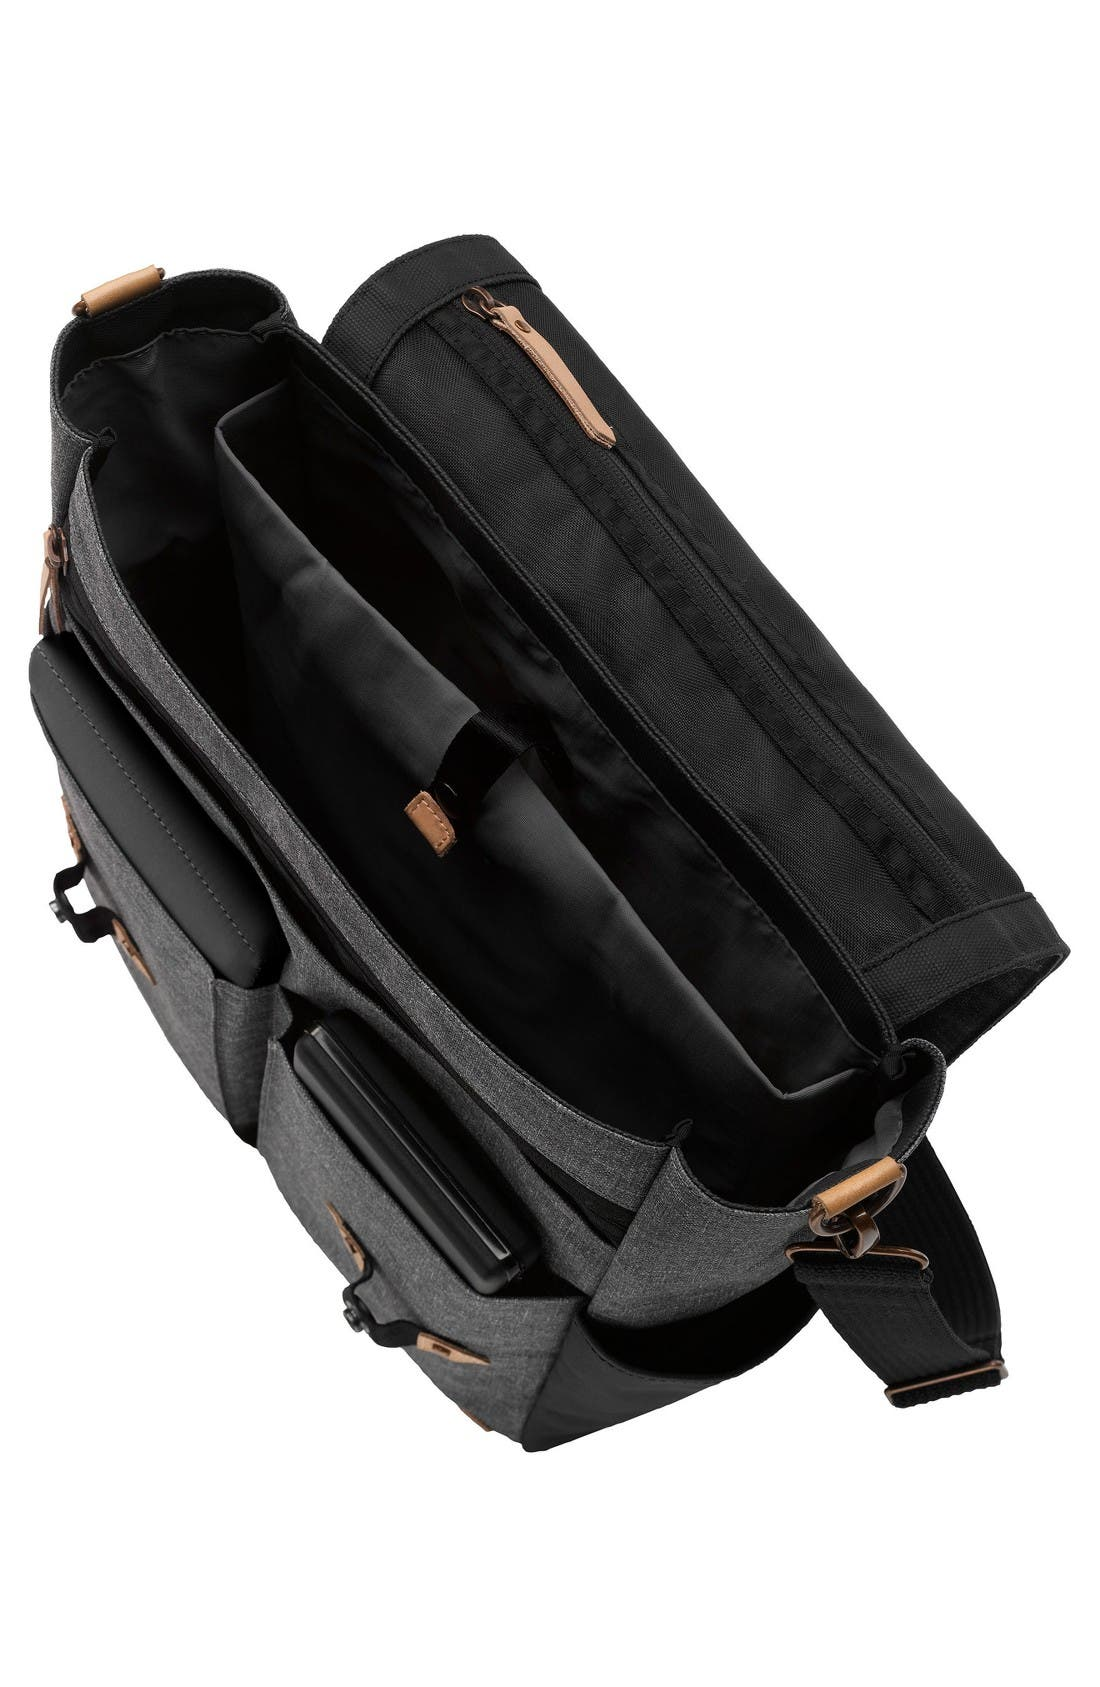 Alternate Image 3  - Petunia Pickle Bottom Pathway Backpack Diaper Tote